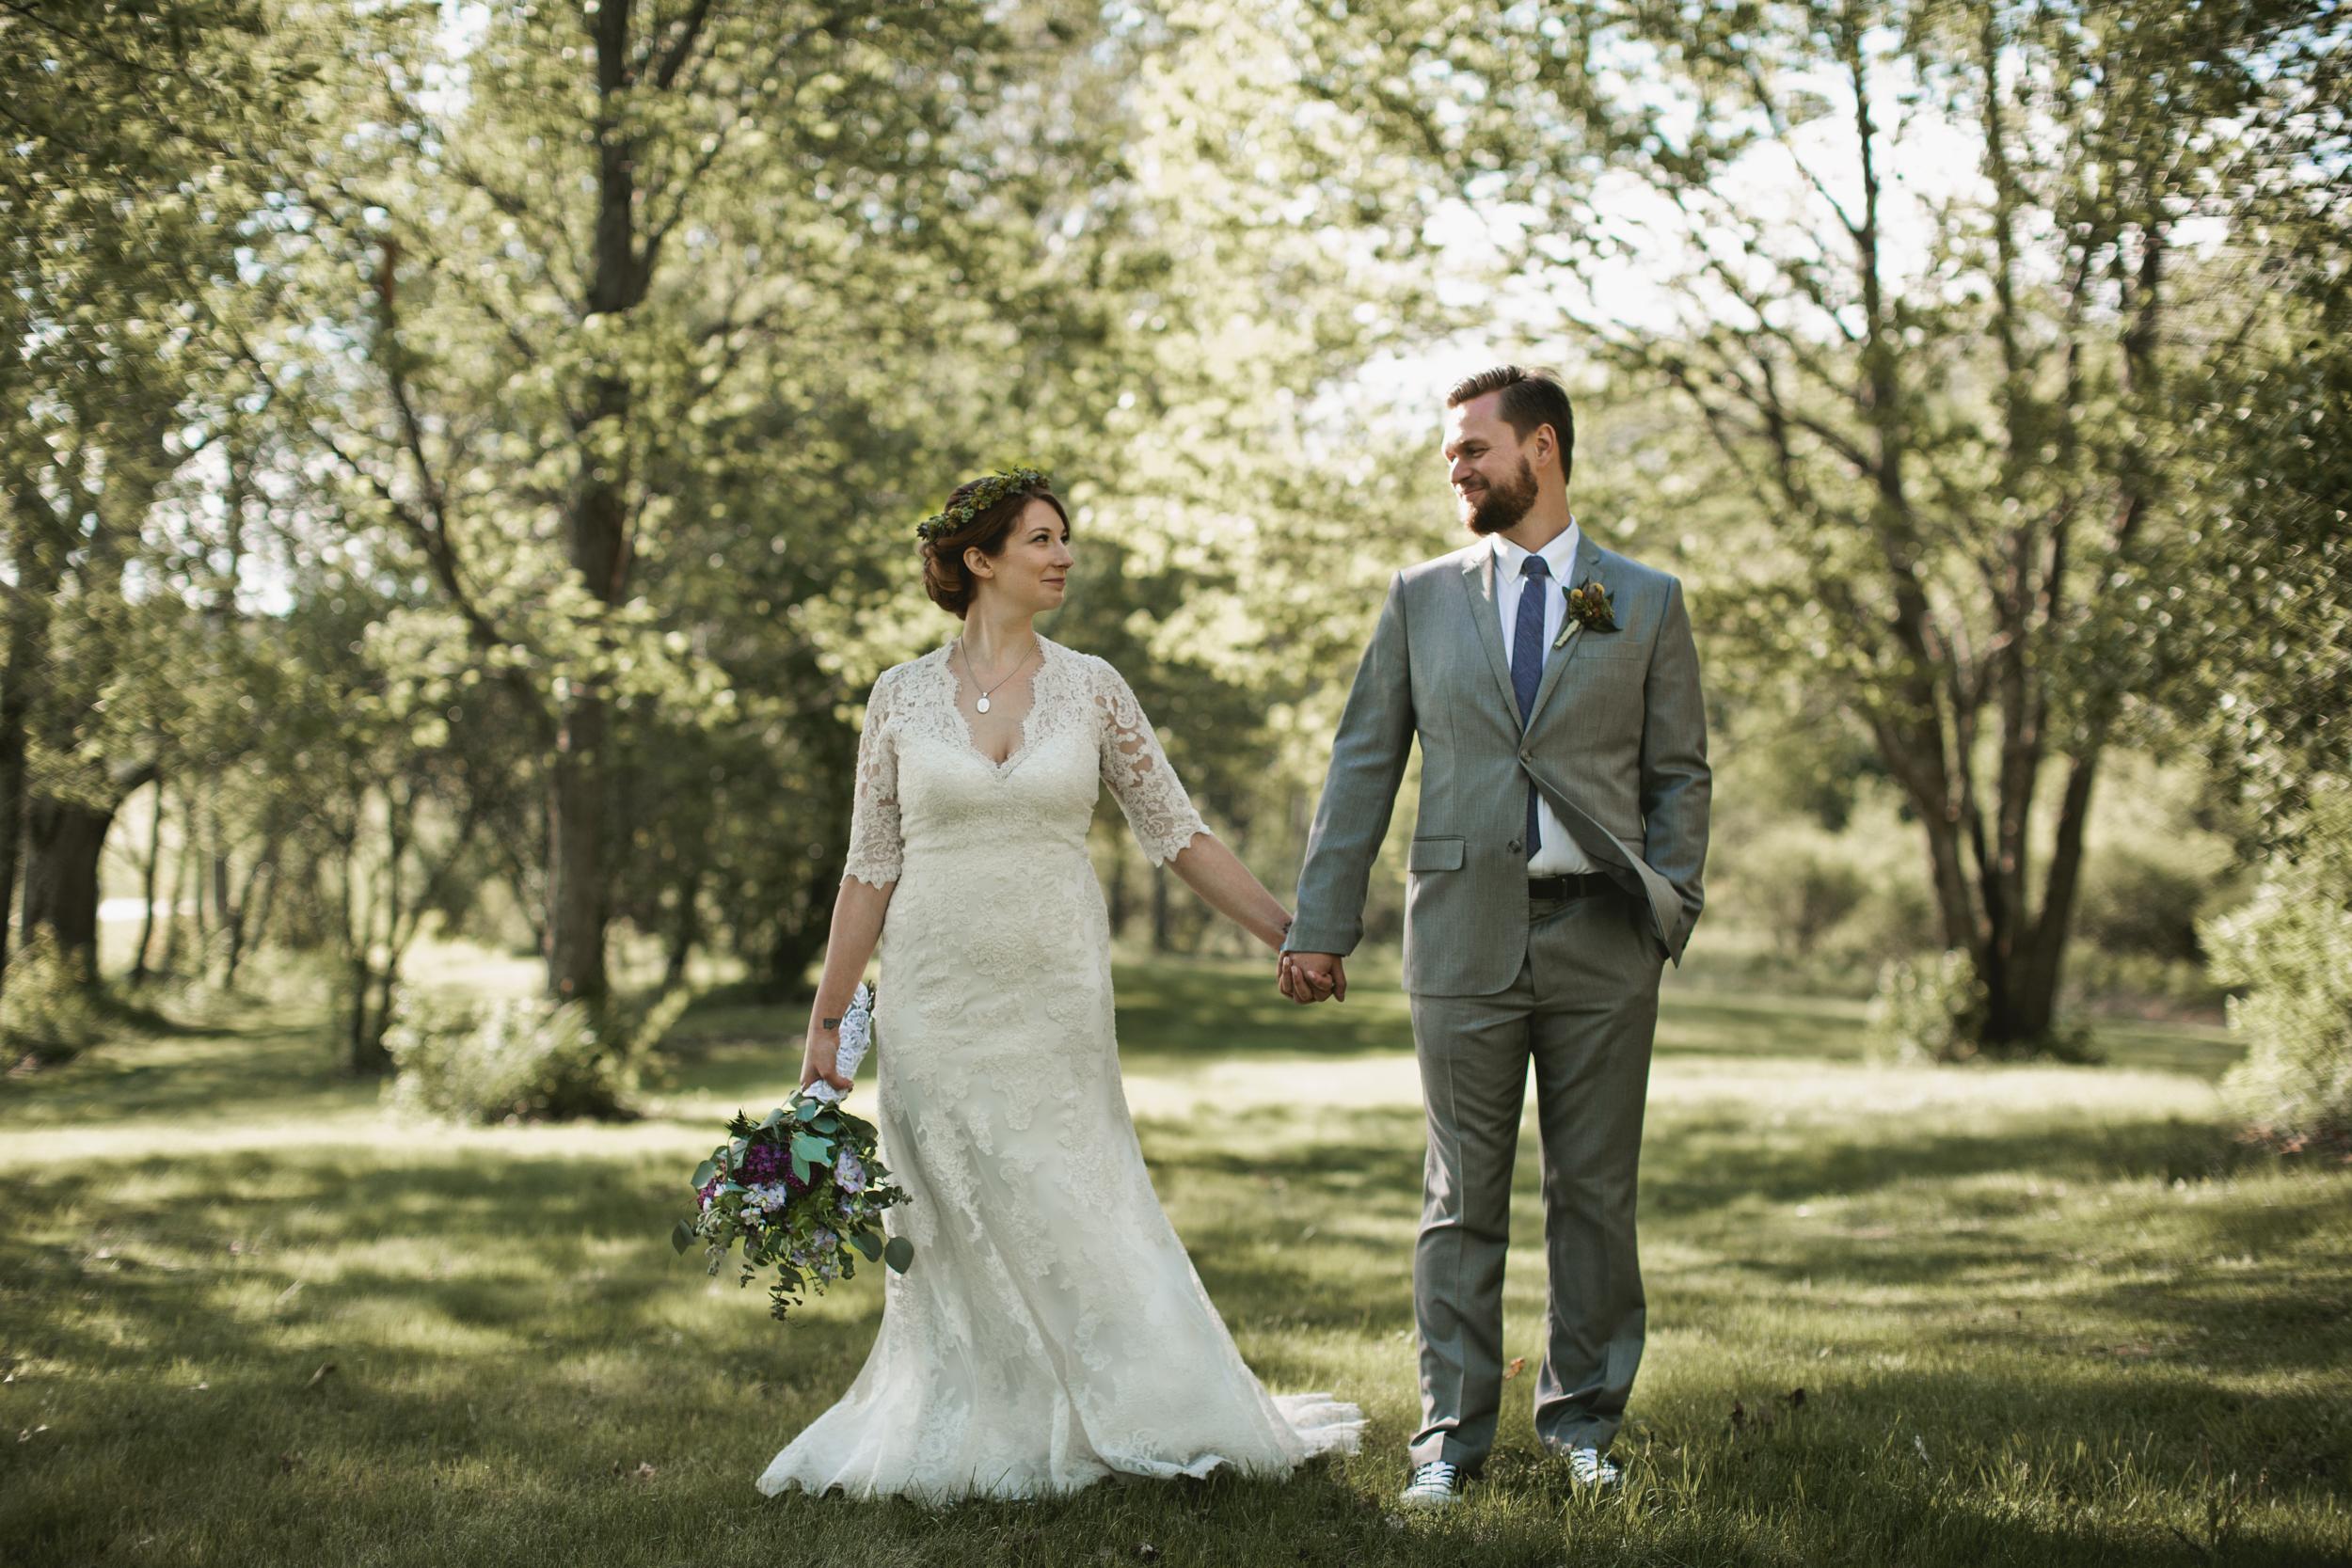 Spring-Meadows-Maine-Wedding-143.jpg